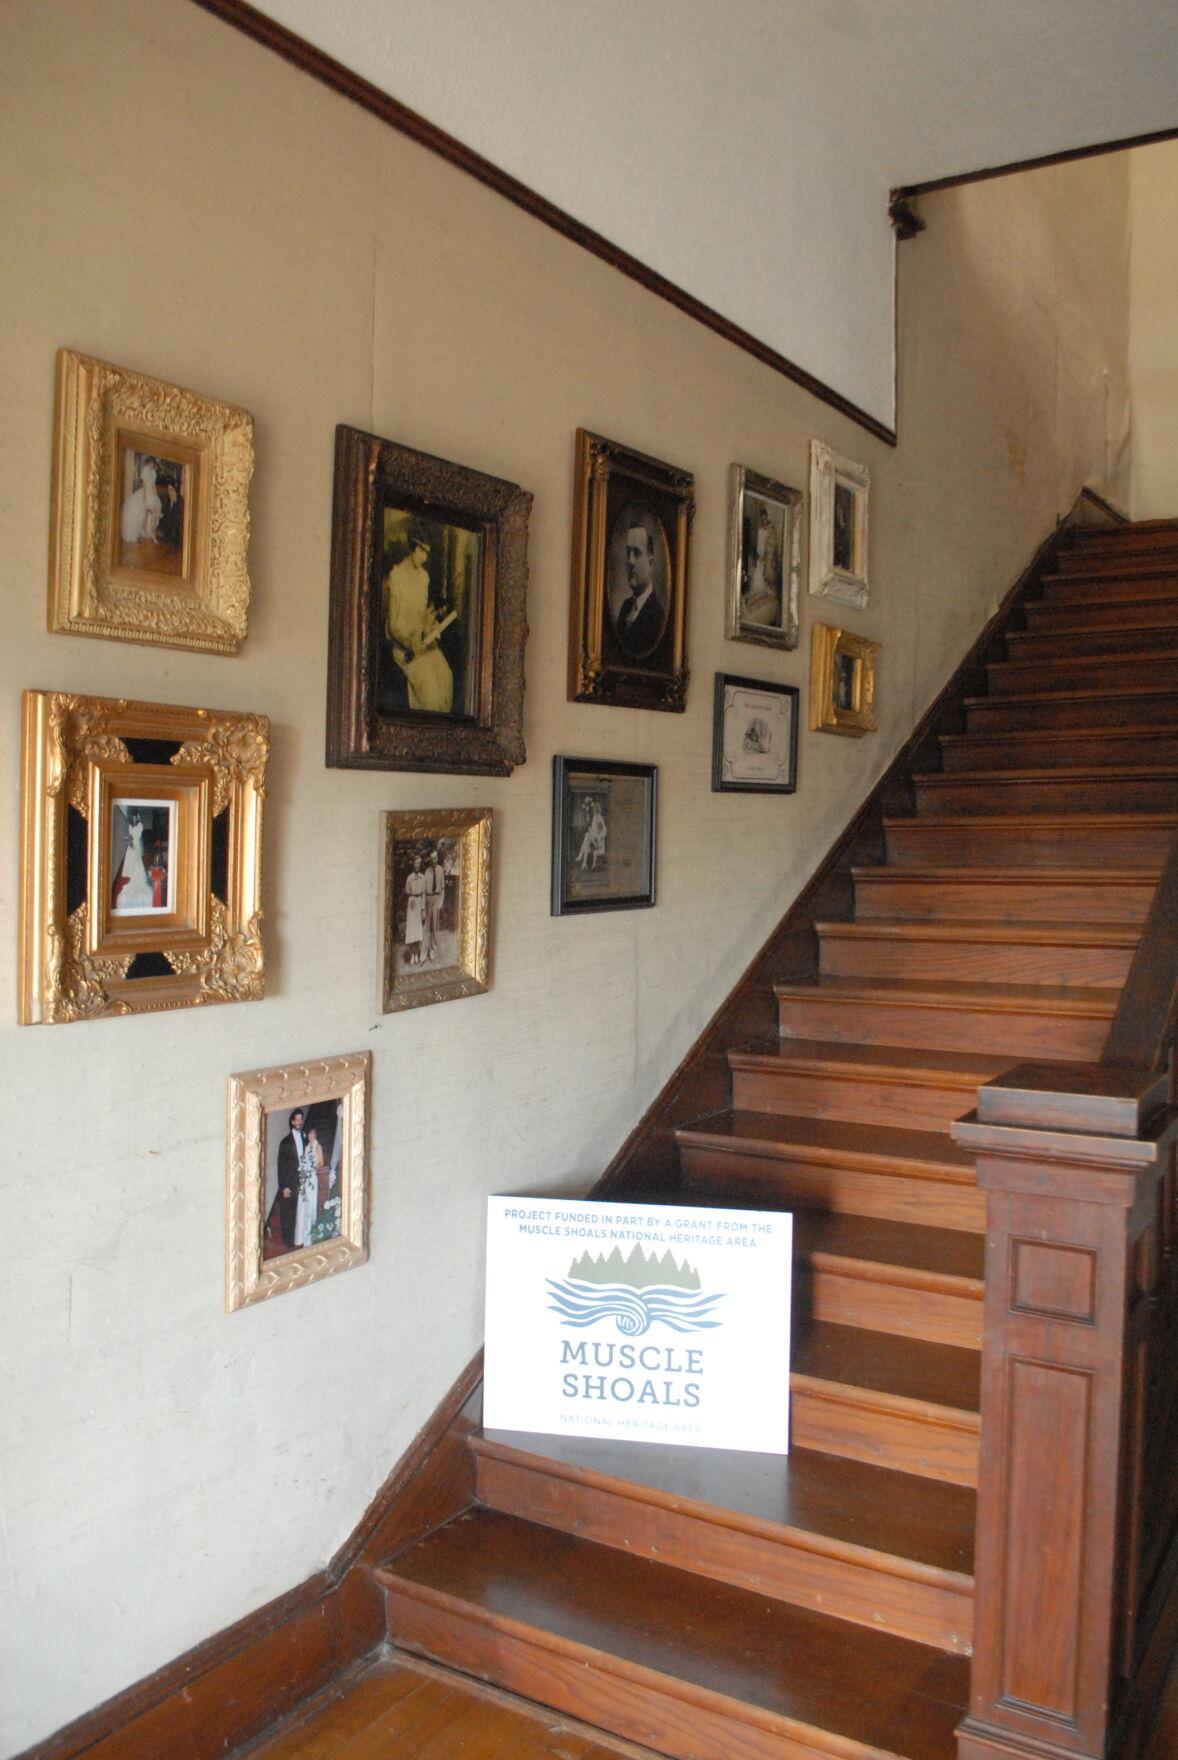 Historic Jackson House sees original floors restored thanks to MSHNA grant